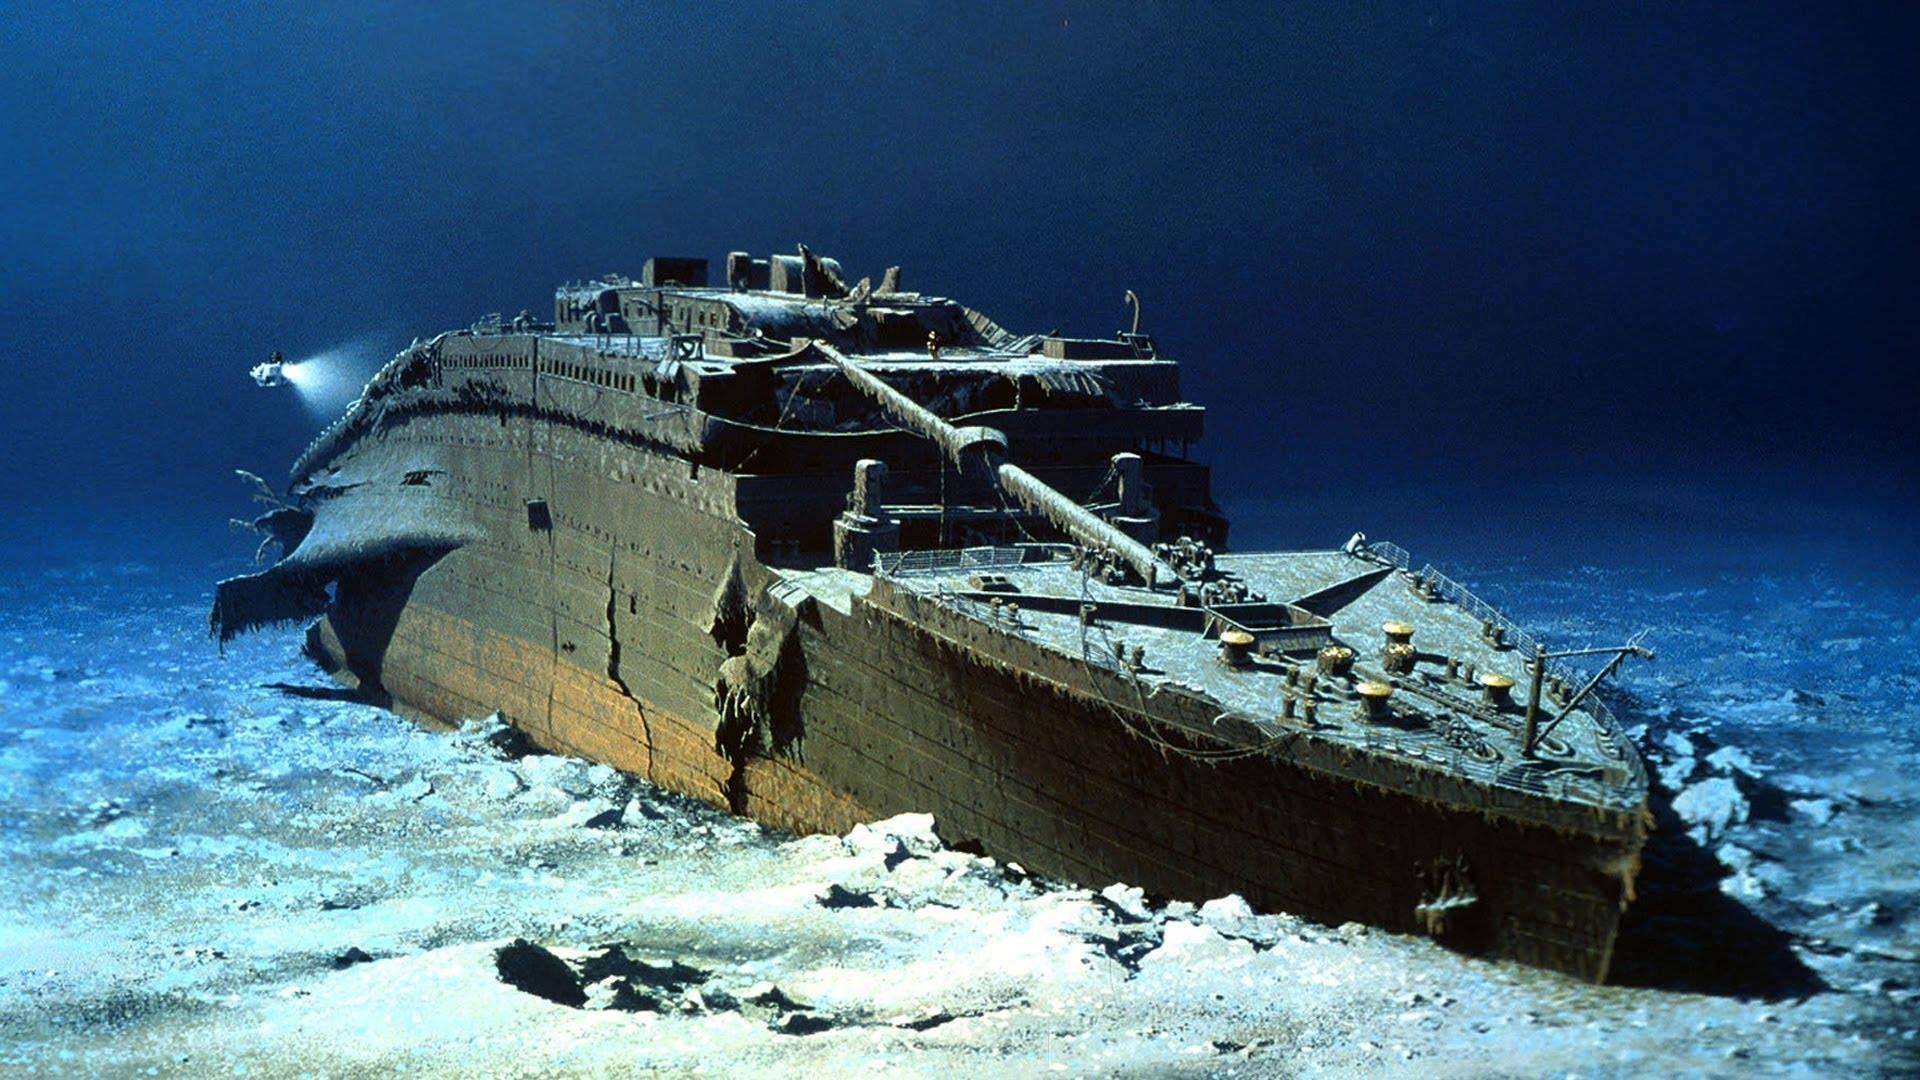 ship models おしゃれまとめの人気アイデア pinterest tamura hideo 深海